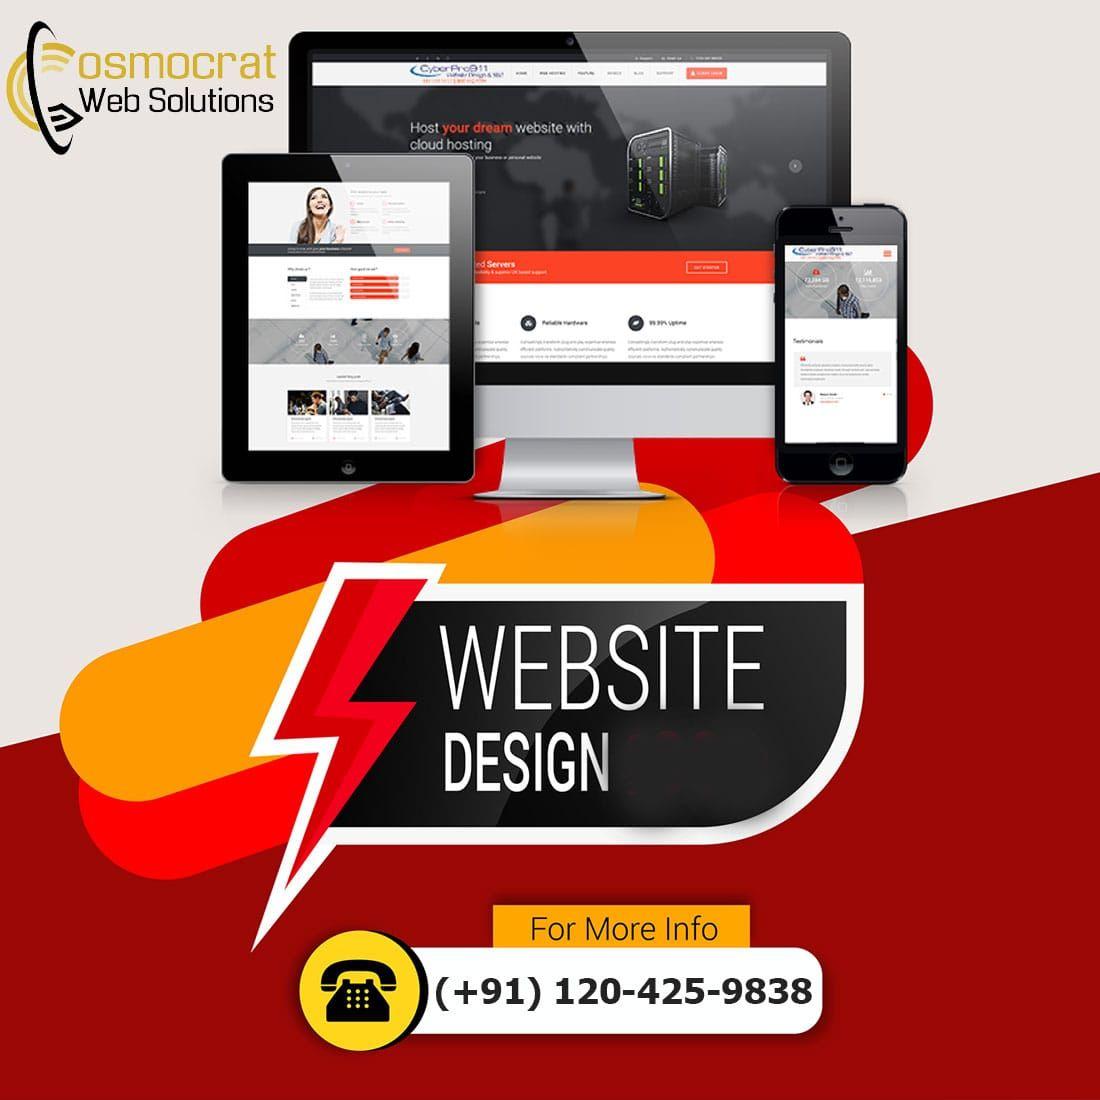 Web Design Company In Australia Cosmocratwebsolutions Com In 2020 Website Design Services Web Design Company Website Design Company